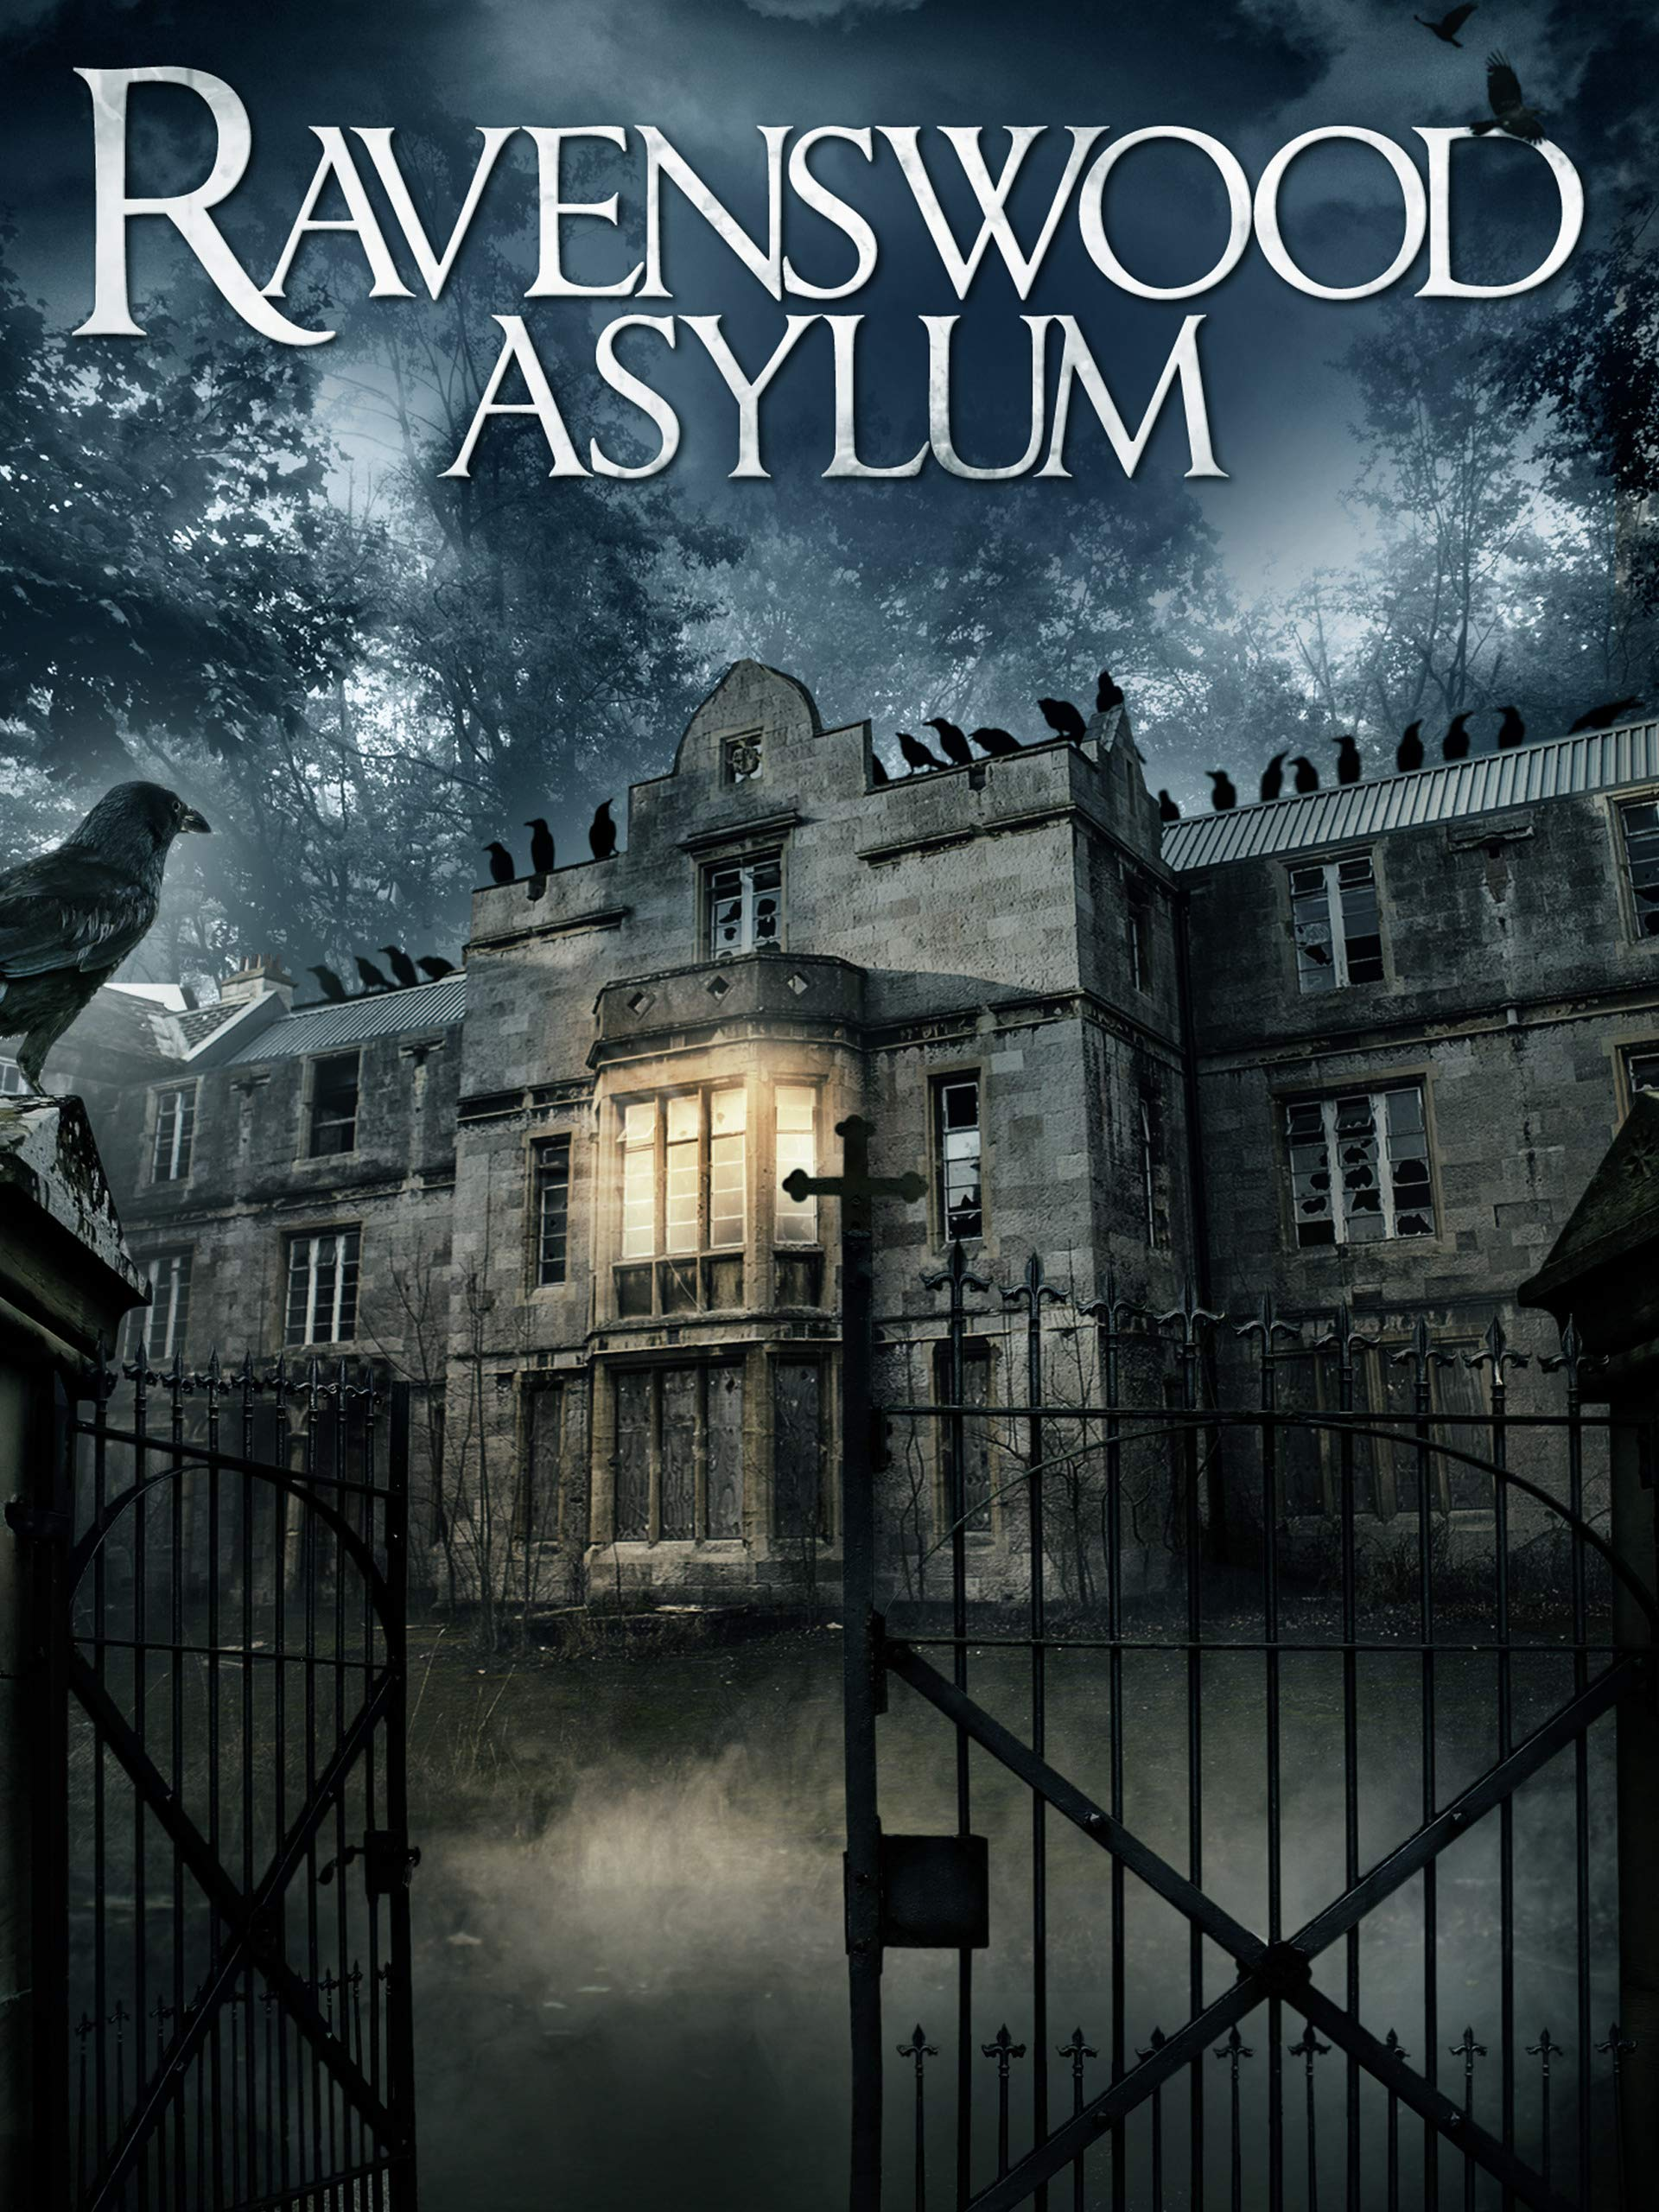 Ravenswood Asylum